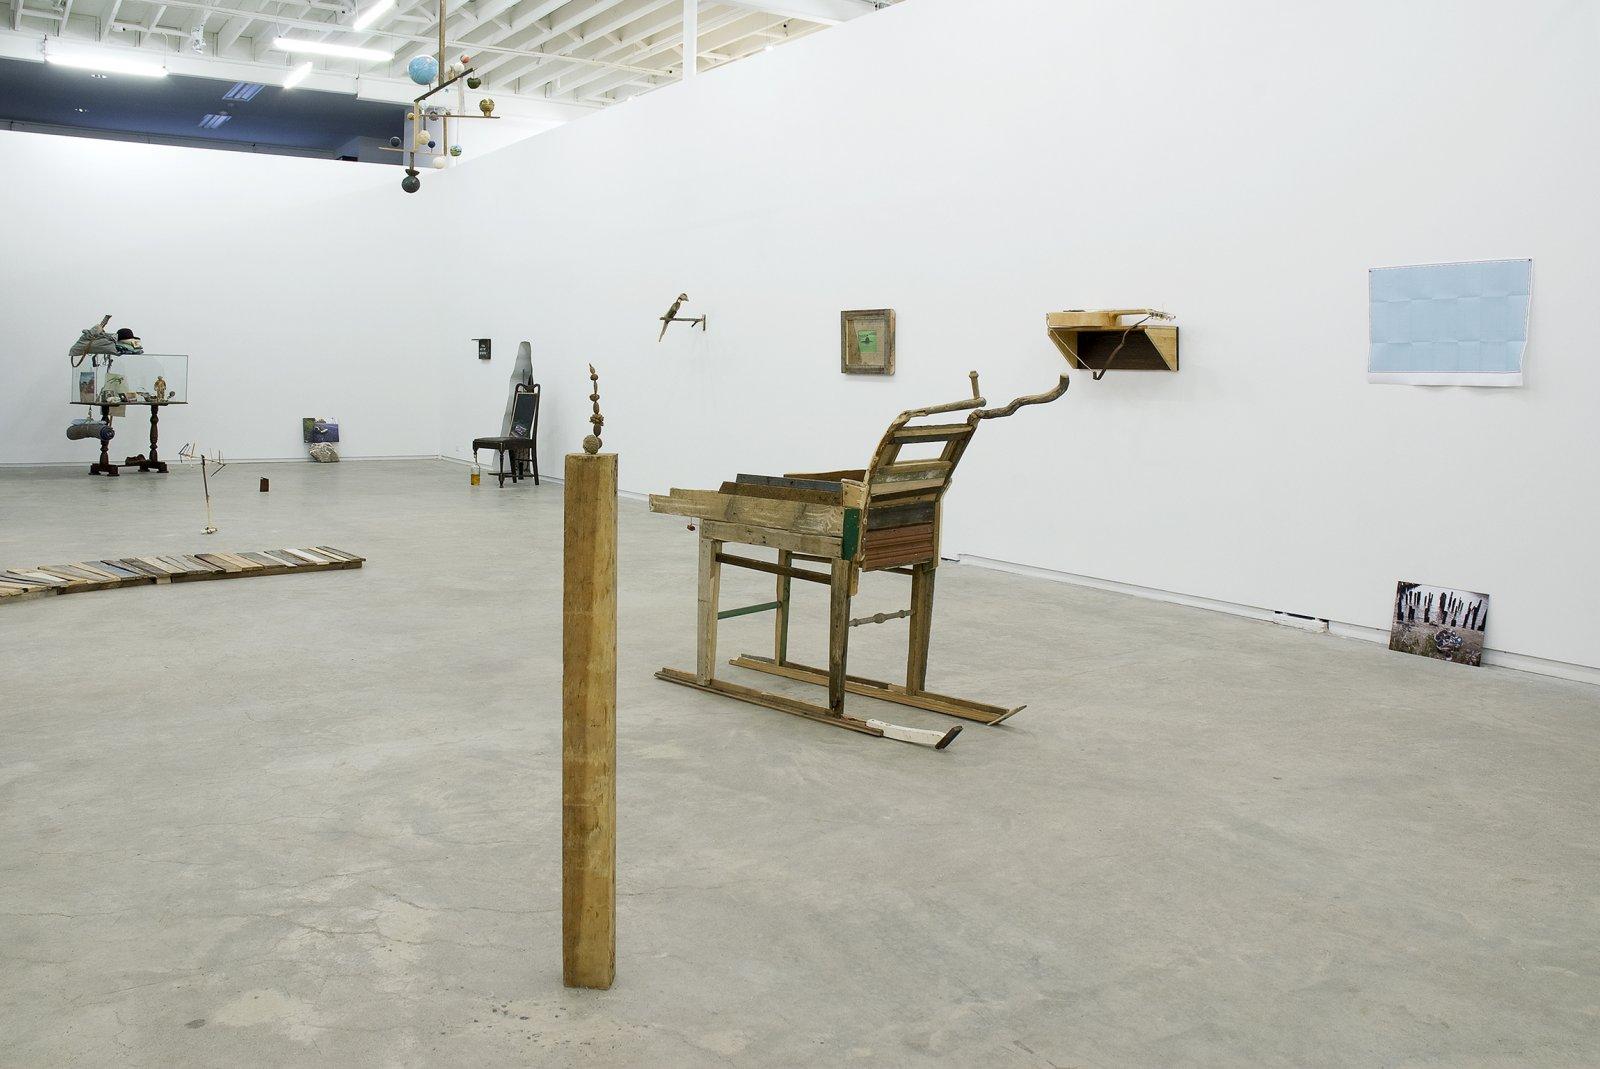 Gareth Moore, installation view, Uncertain Pilgrimage, Catriona Jeffries, 2009  by Gareth Moore